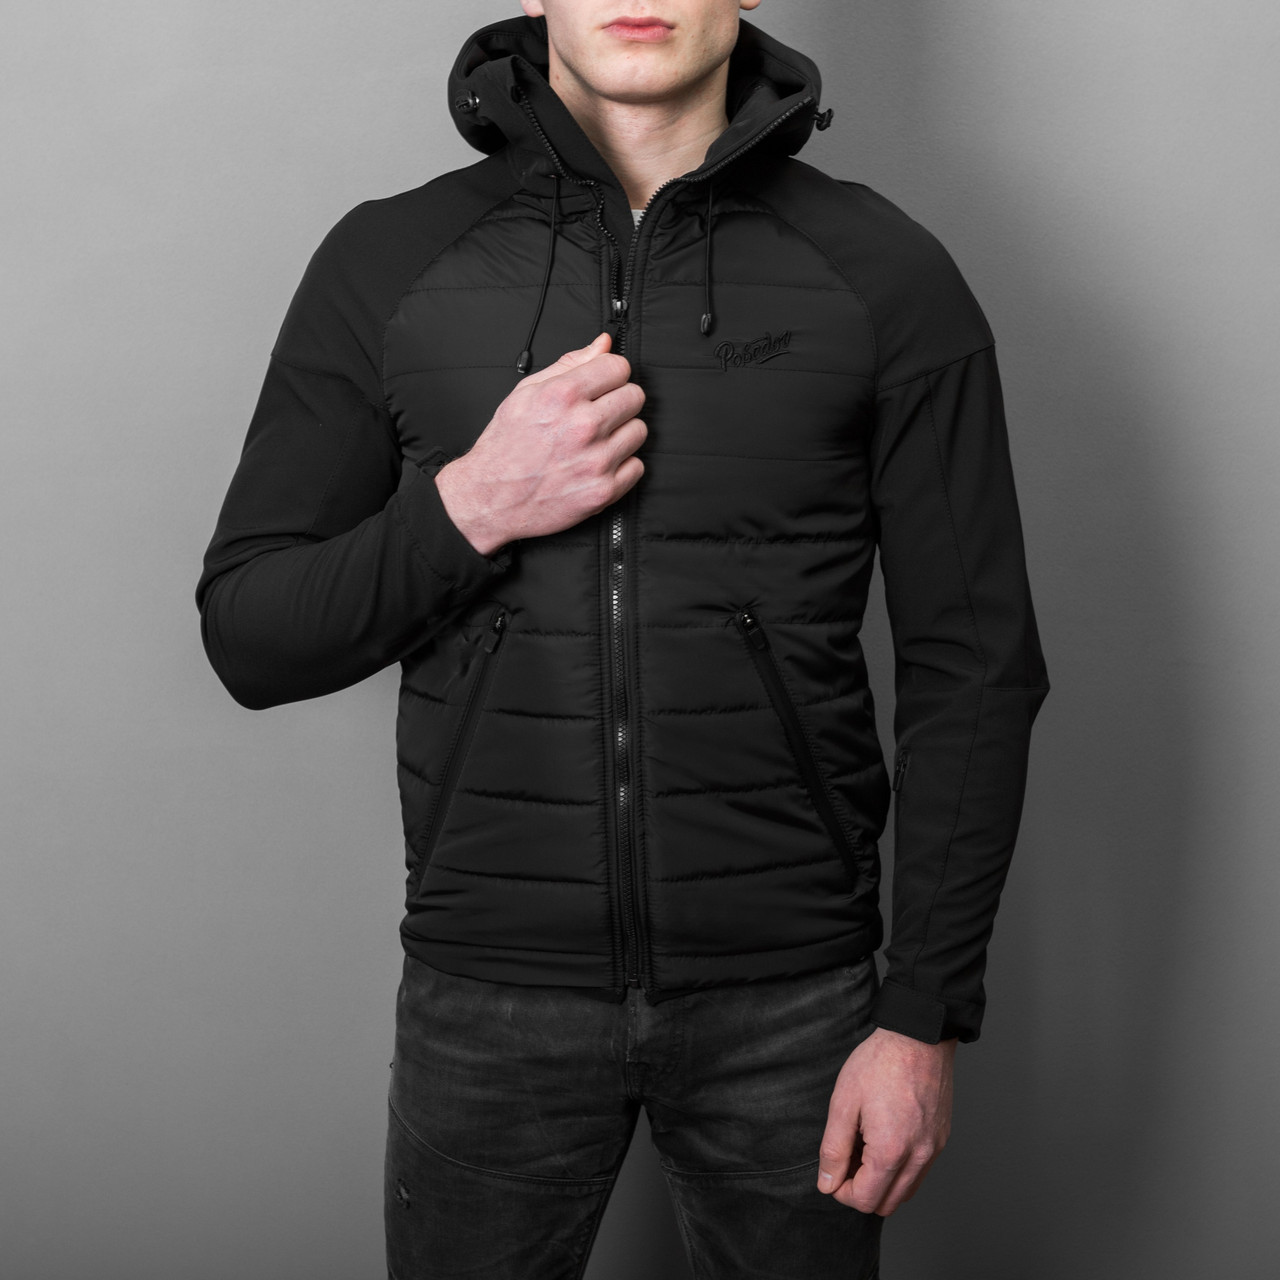 Мужская Весенняя куртка Soft Shell Combi